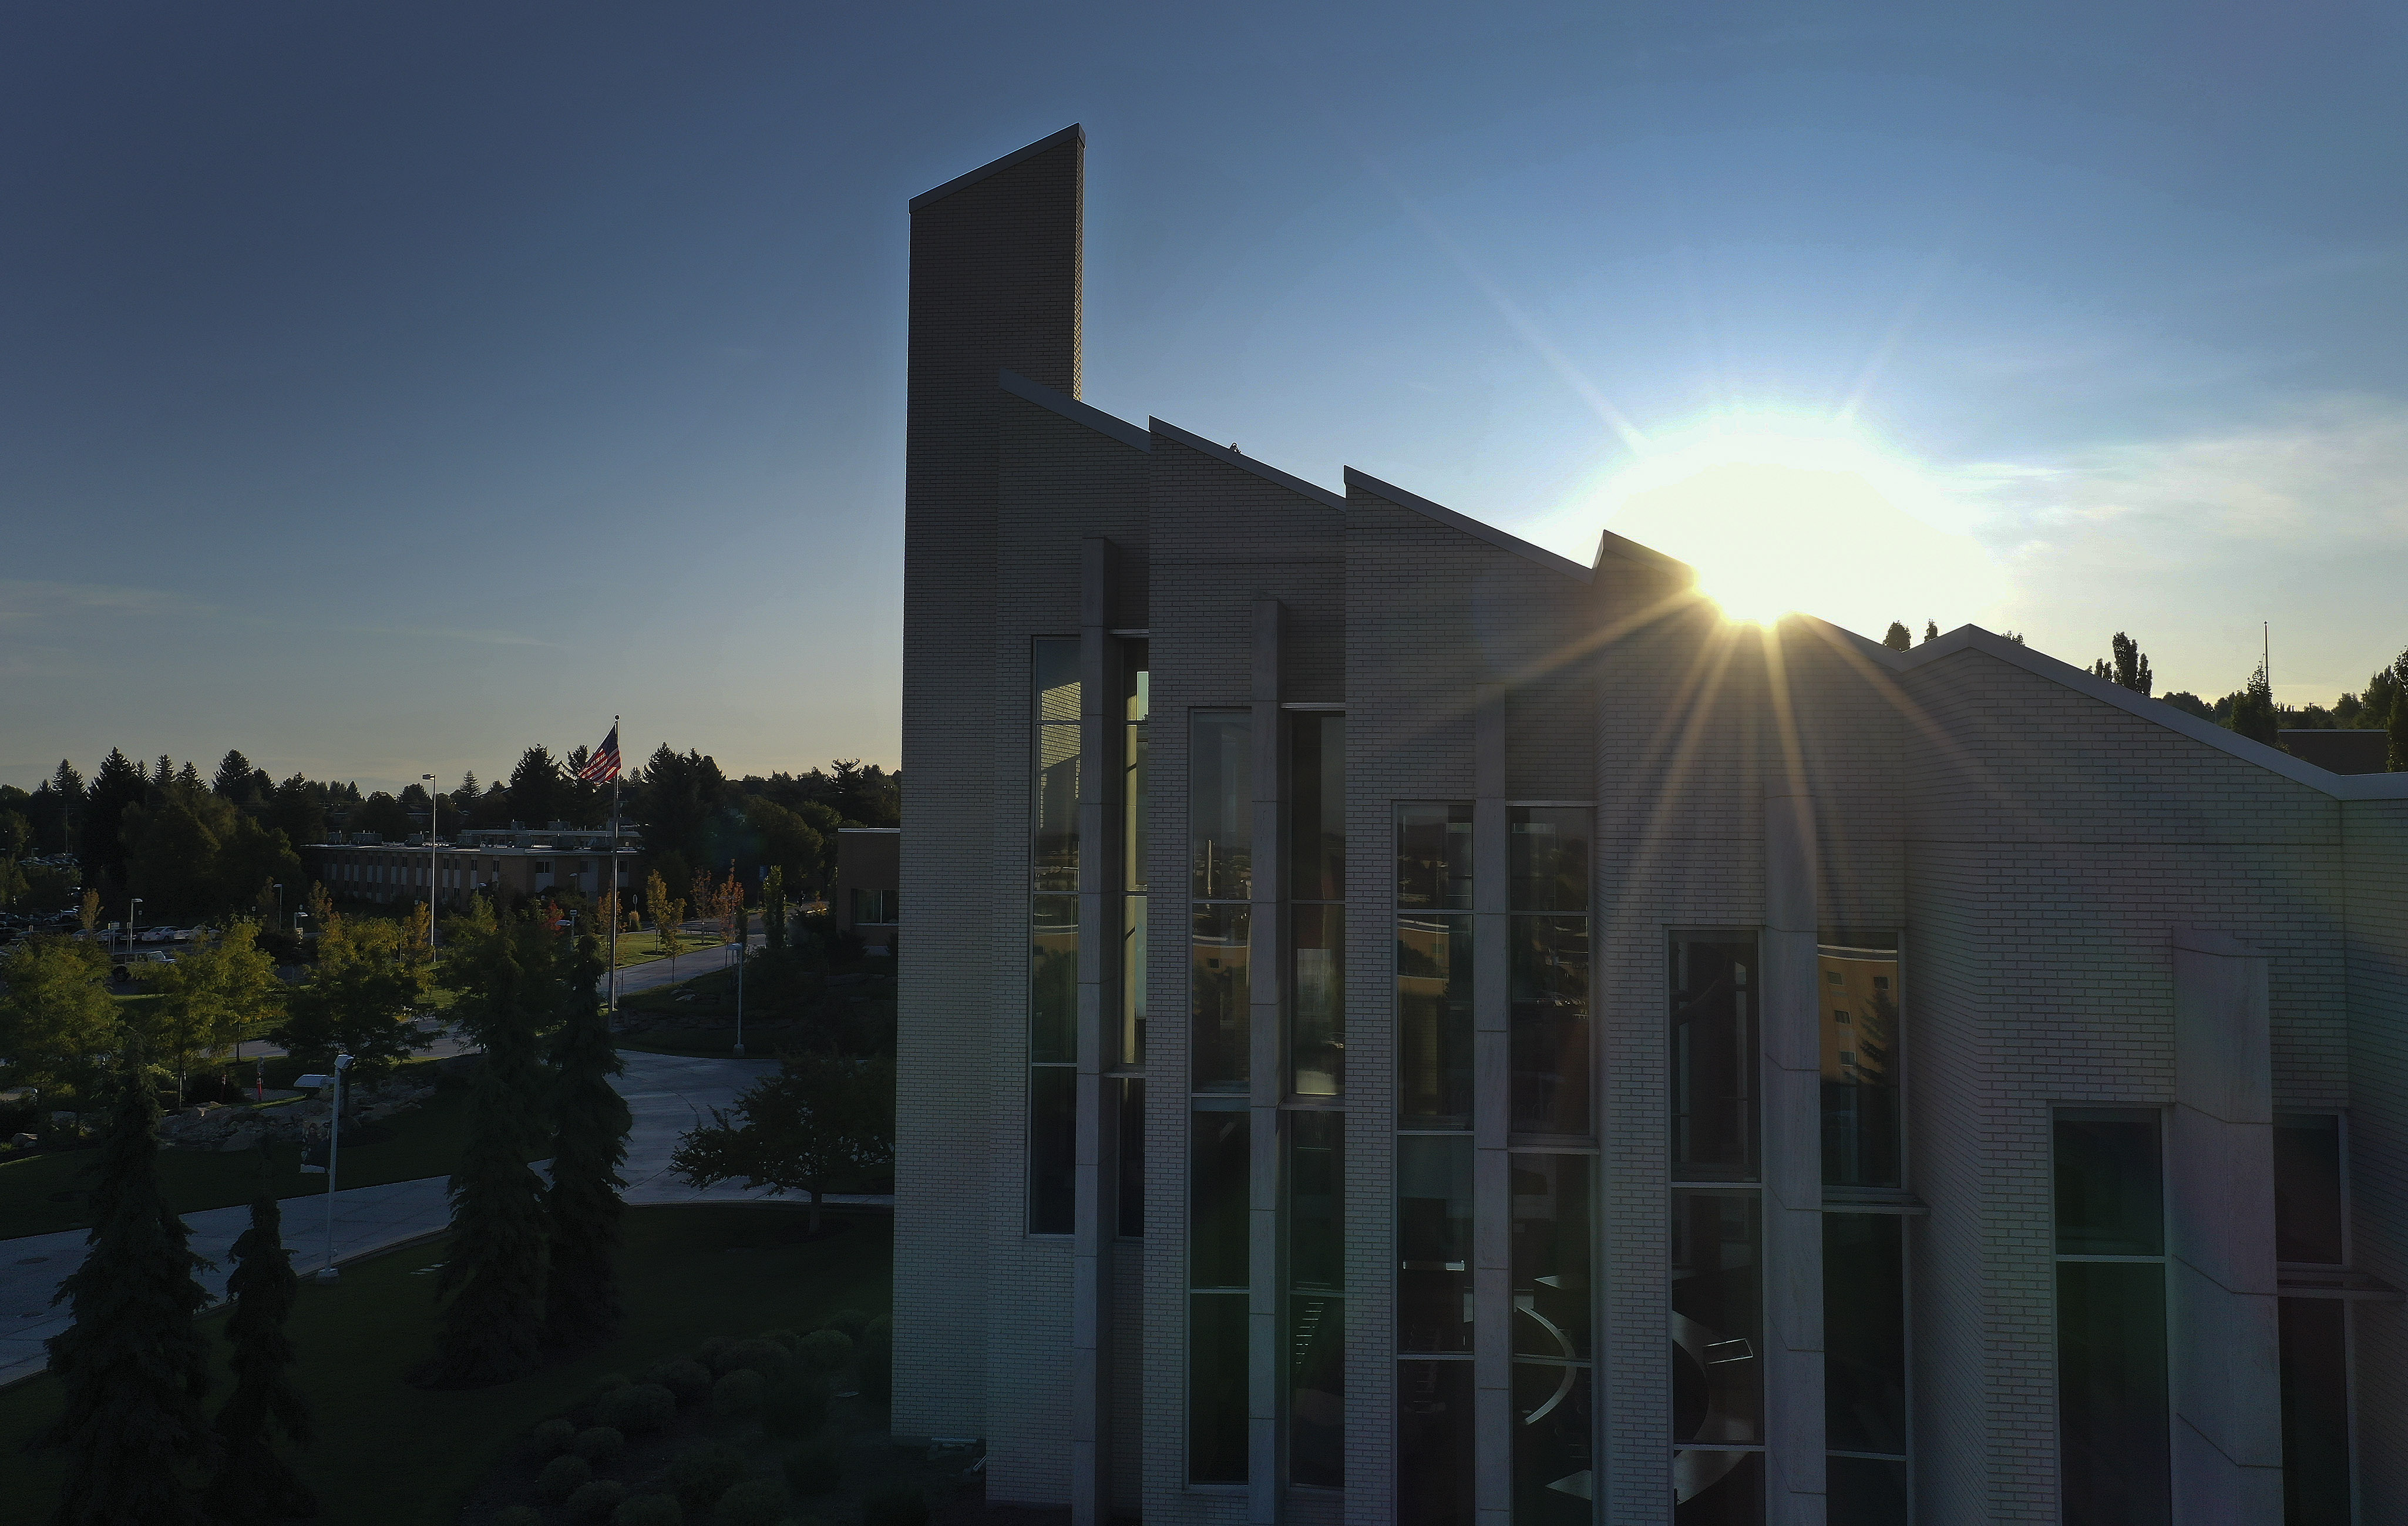 The sun rises on BYU Idaho campus in Rexburg on Monday, Sept. 23, 2019.